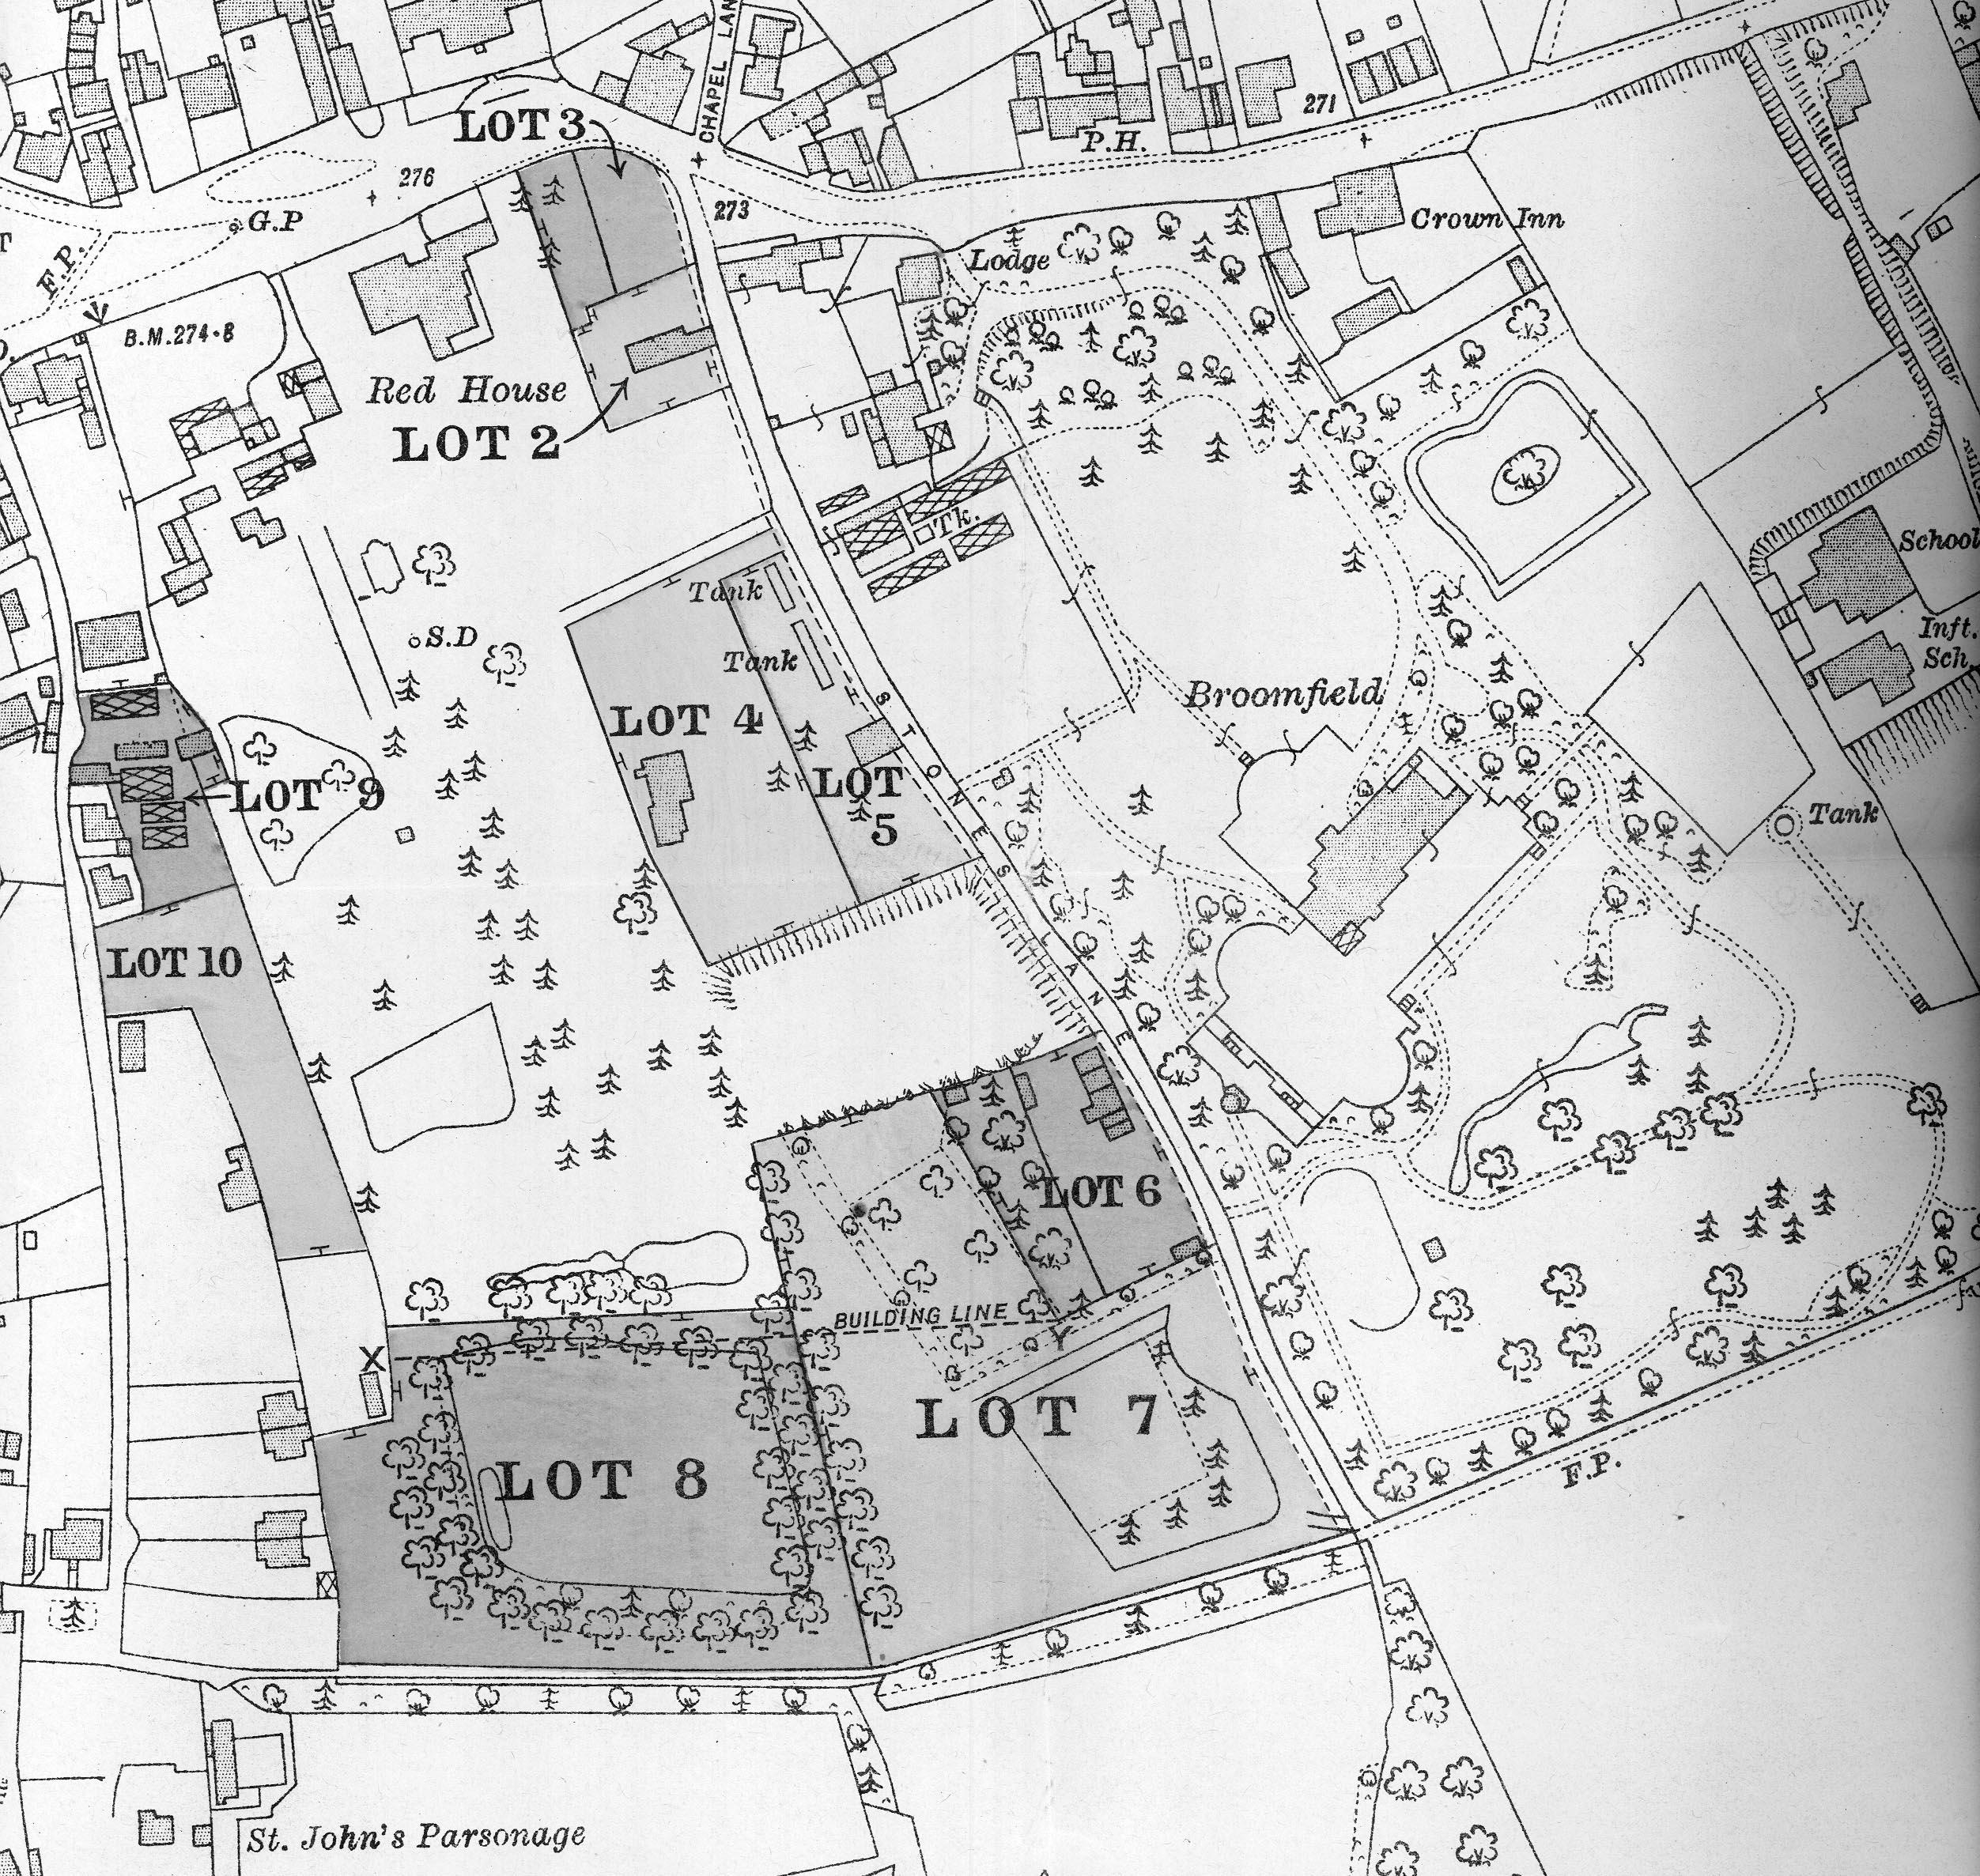 broomfield plan 03c